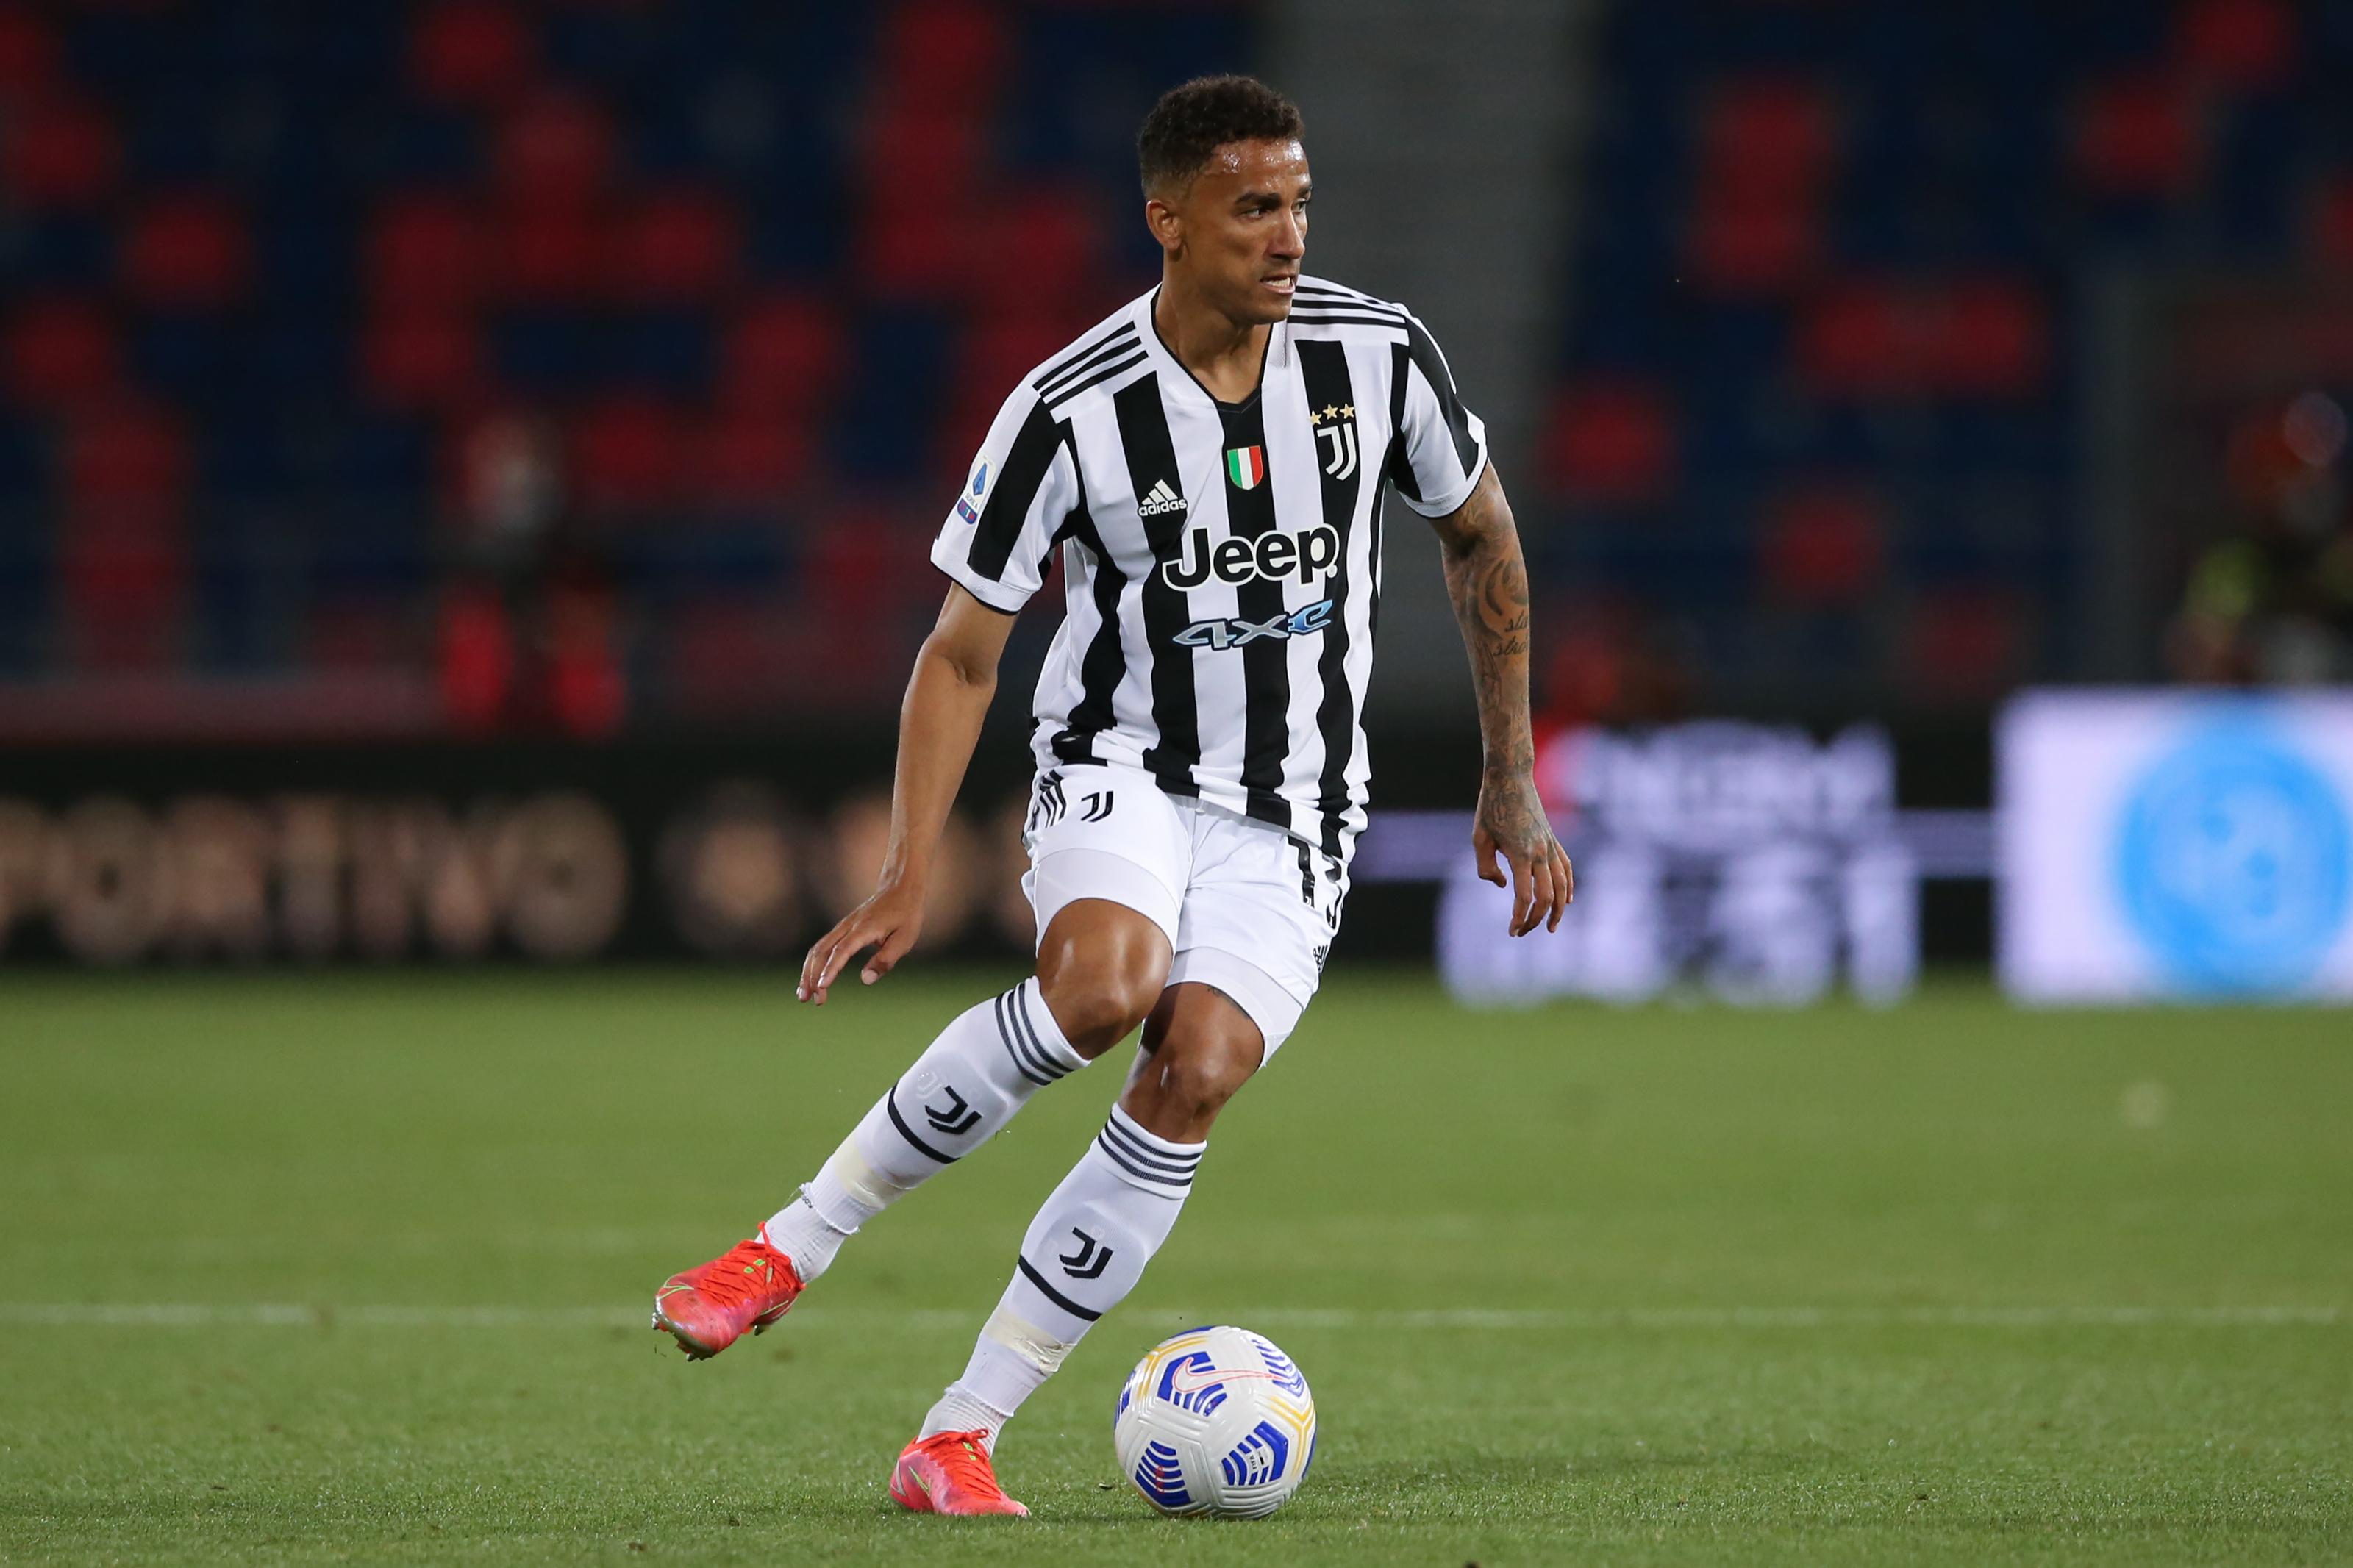 Bayern Munich interested in Juventus full-back Danilo